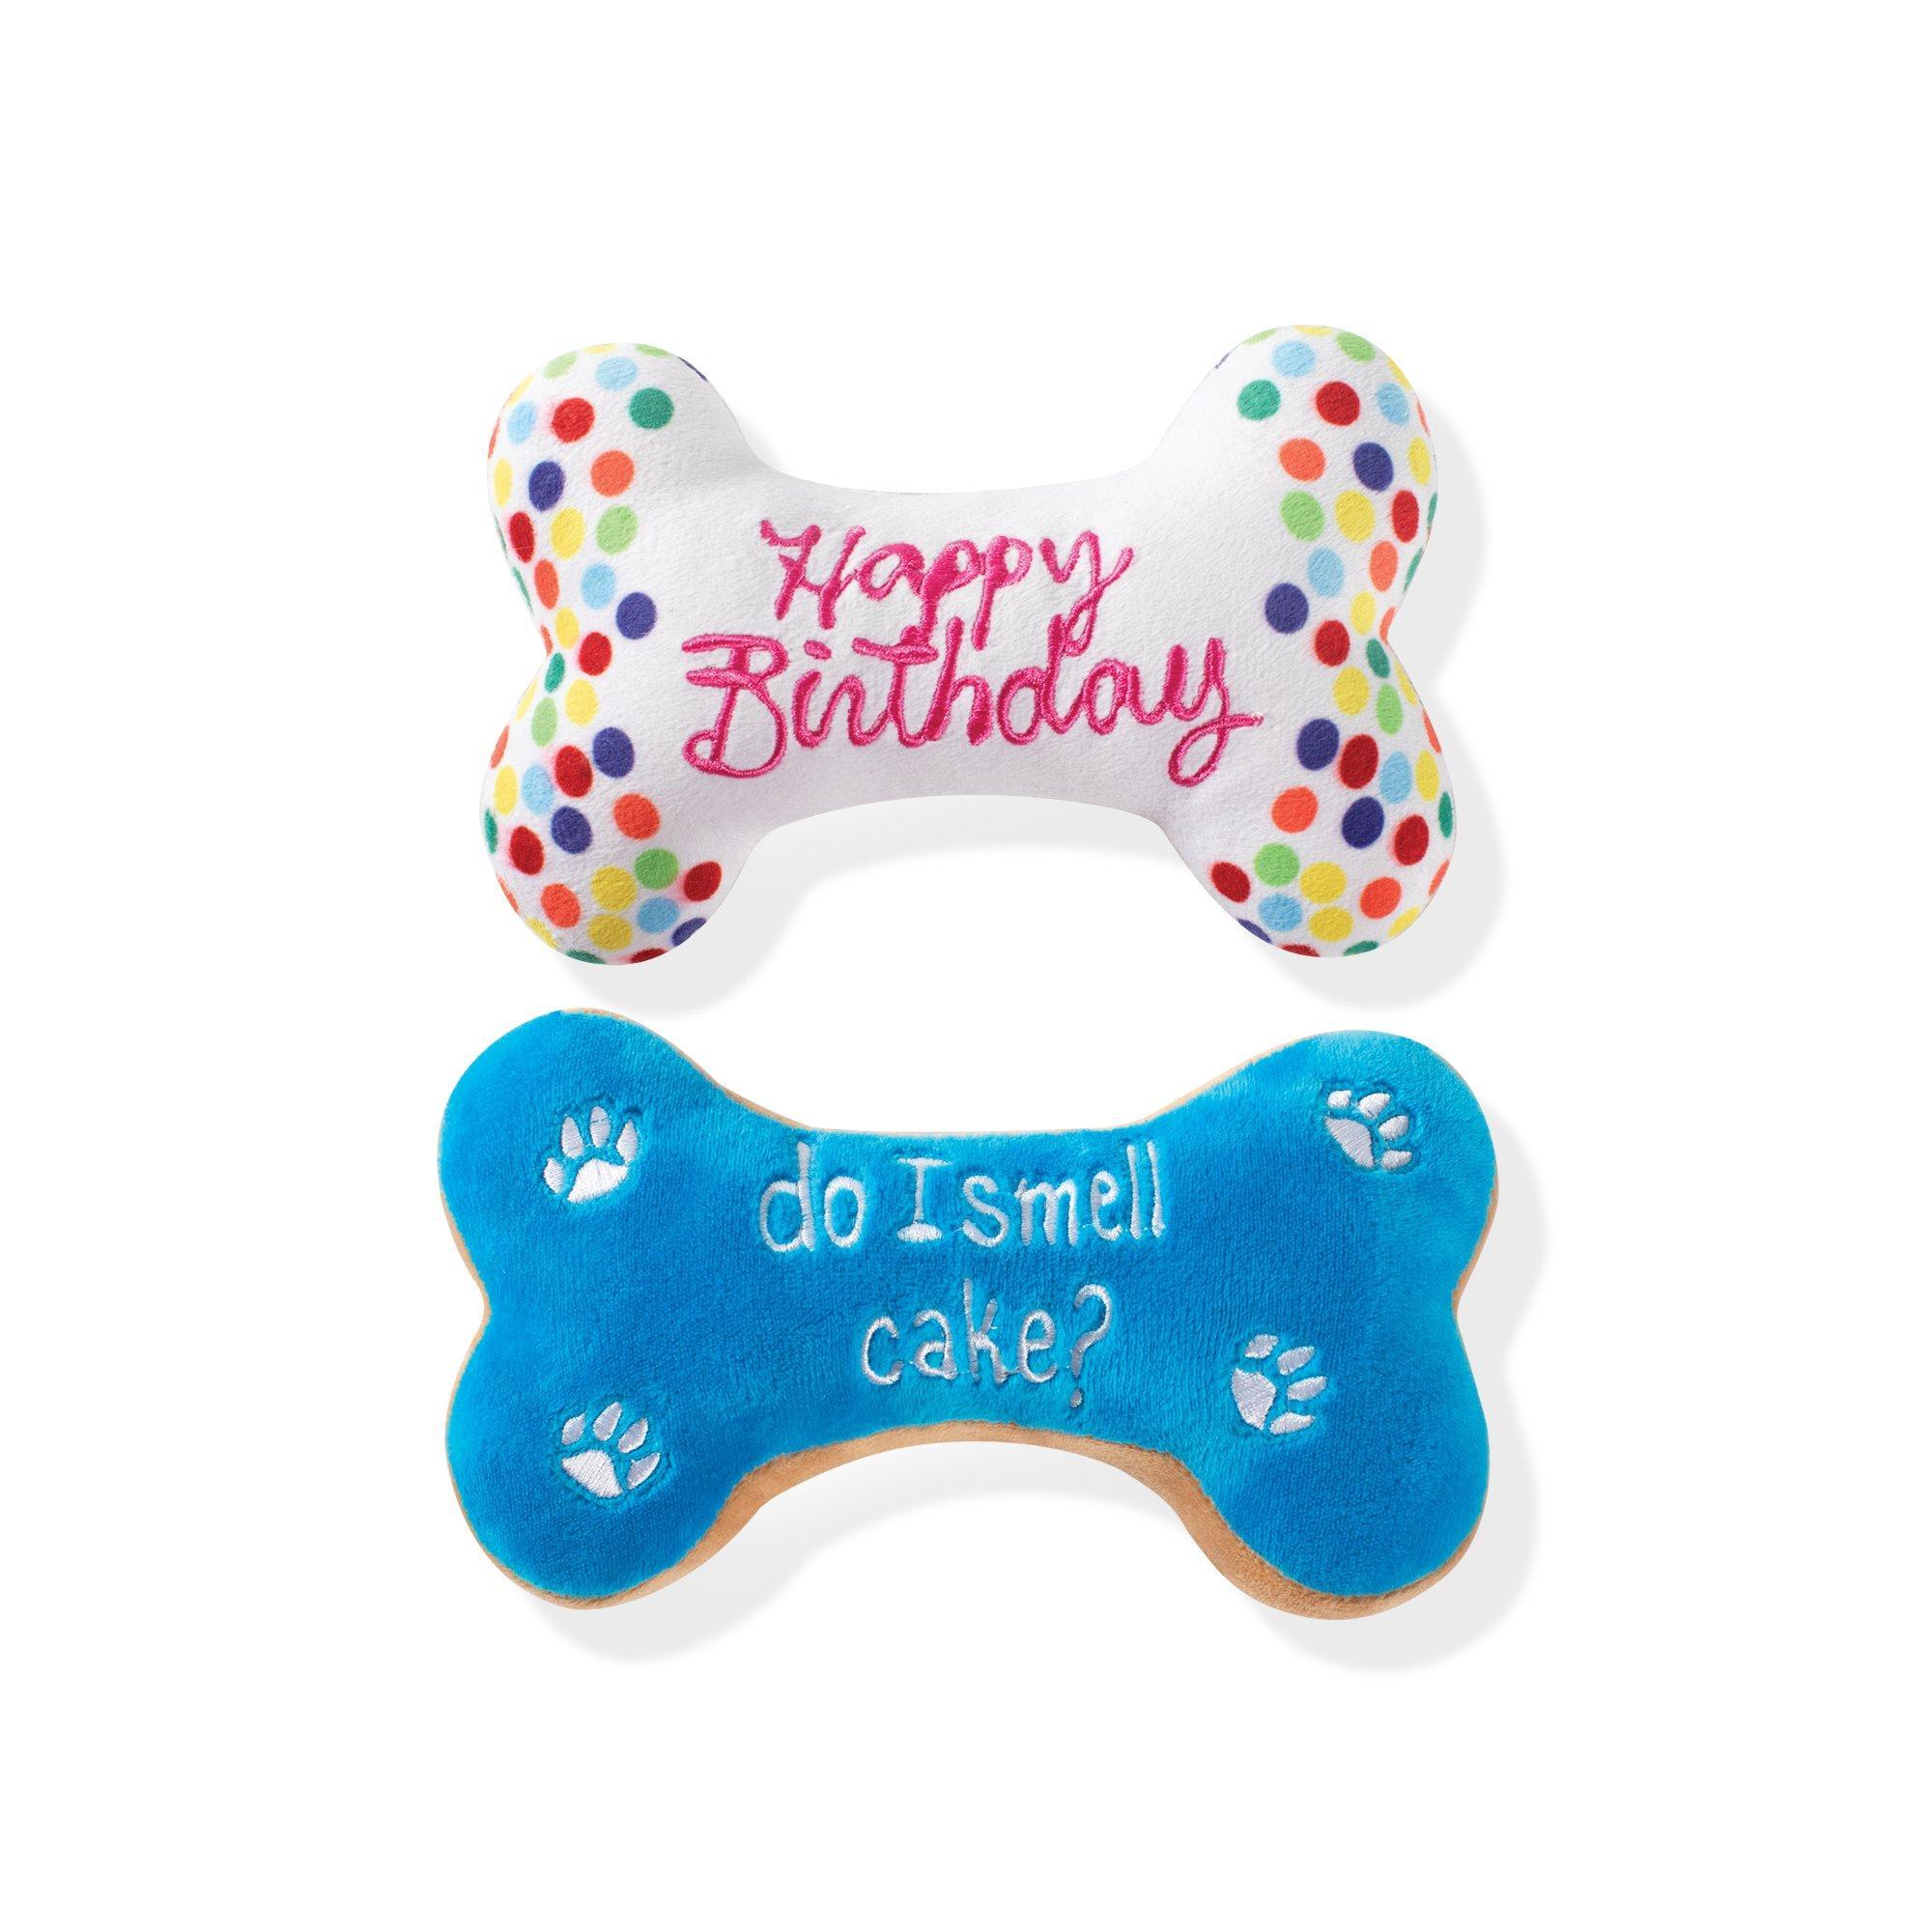 Pet Shop by Fringe Studio Bone Cookies Plush Squeaker Dog Toy, Set of 2 Image